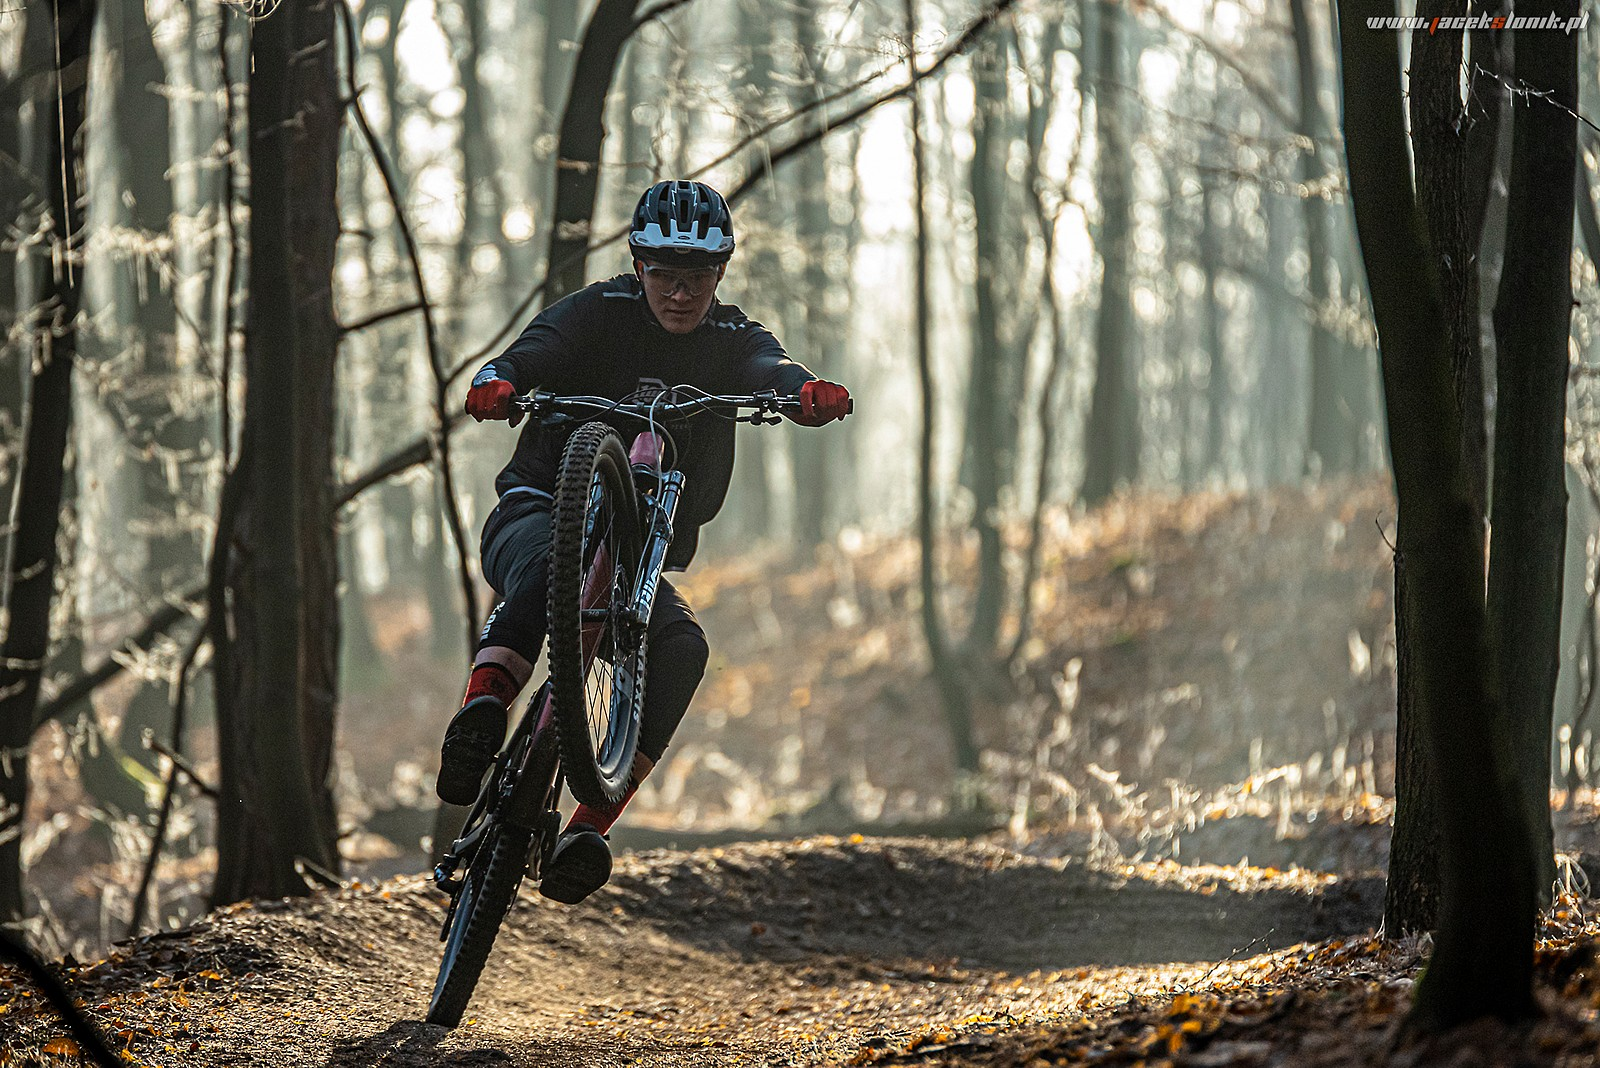 Manual Monday - JacekSlonik - Mountain Biking Pictures - Vital MTB